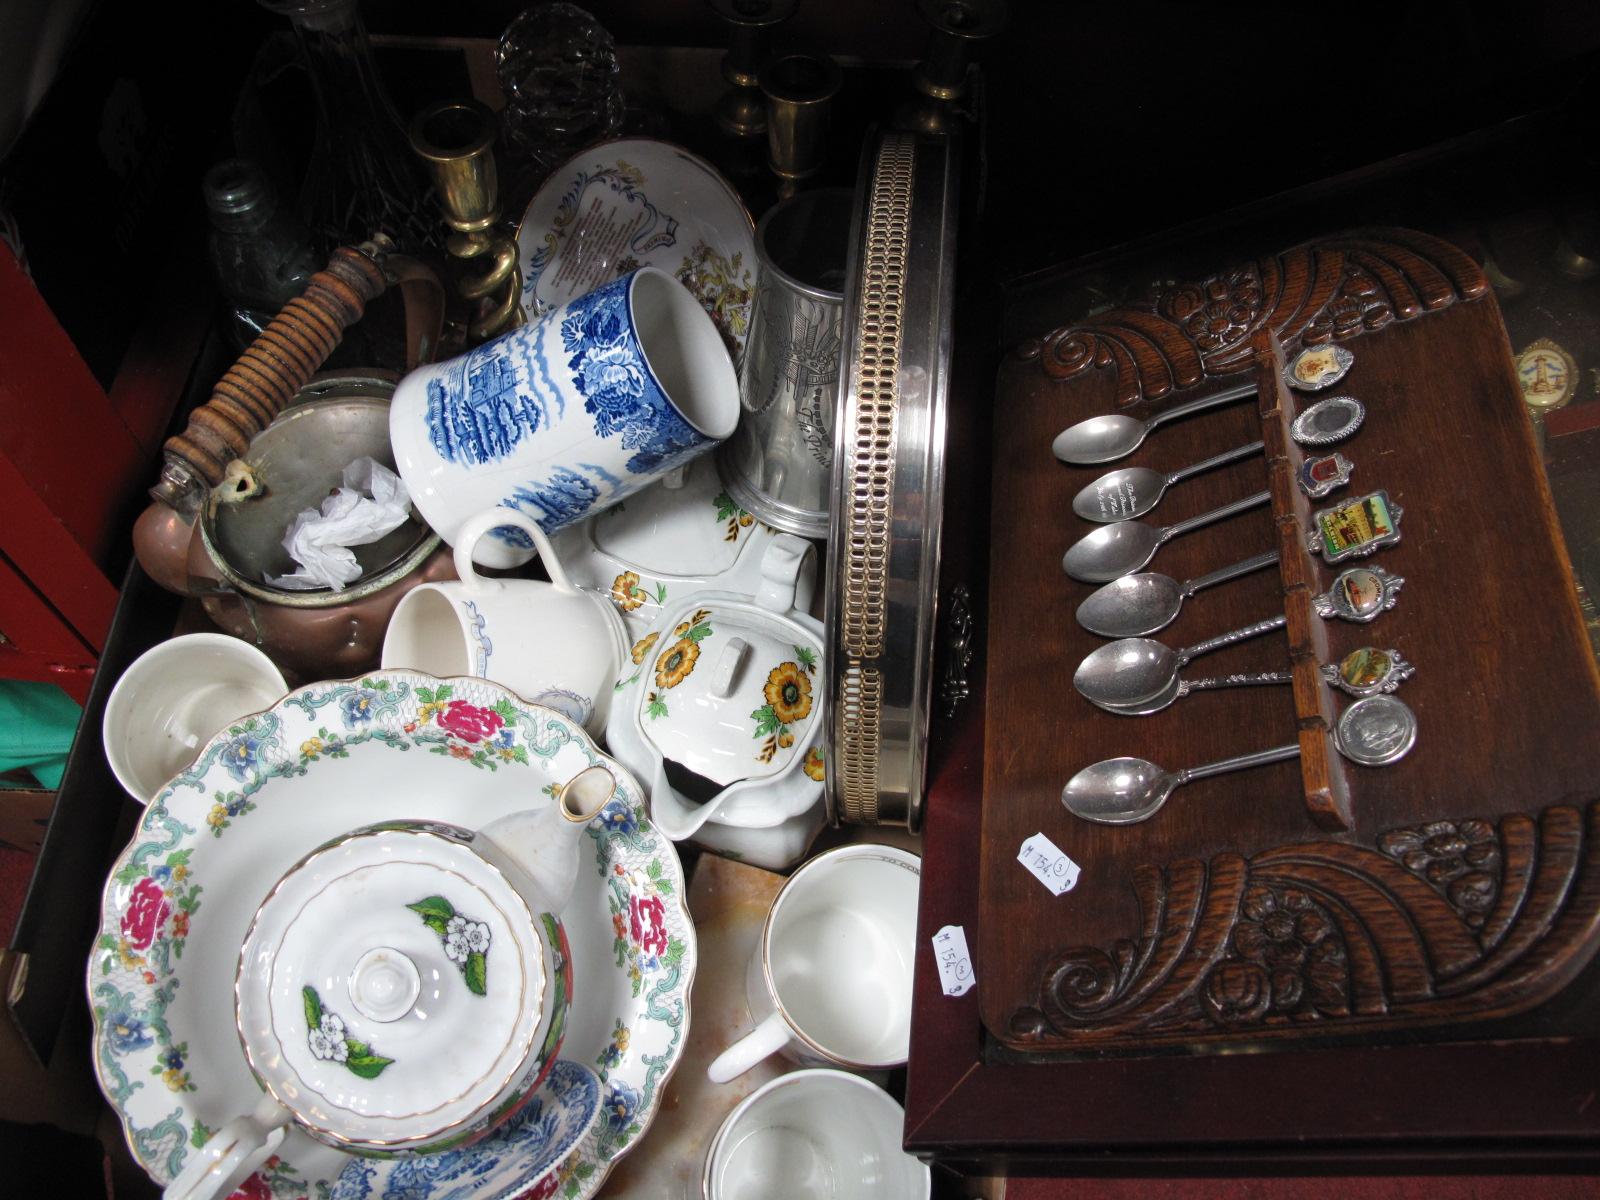 Lot 1023 - Teapots, plates, decanters, brass candlesticks, copper kettle, commemorative ware etc:- One Box plus